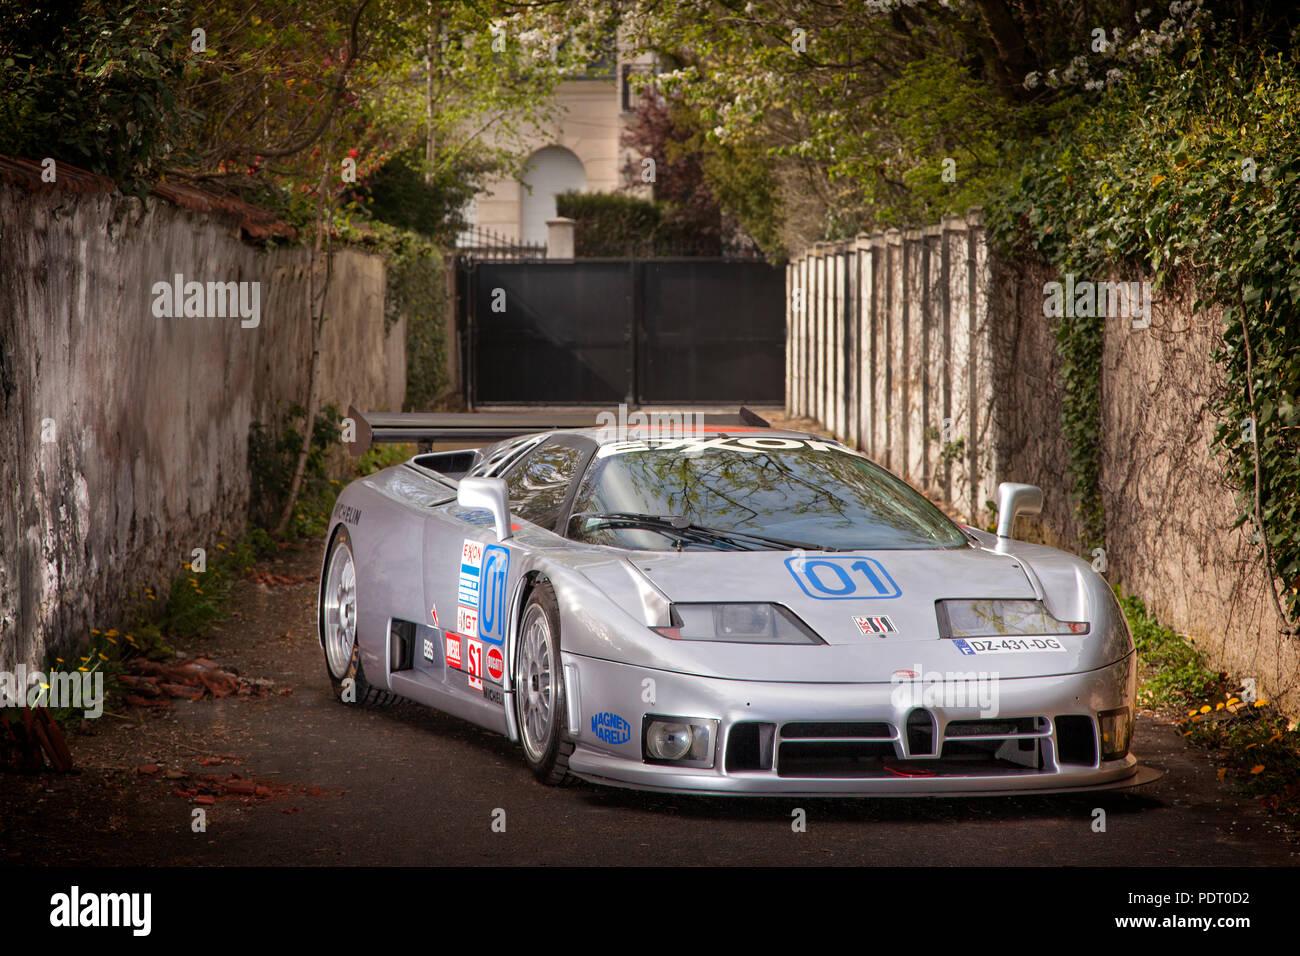 1995 Bugatti EB110 SC GTS-1 IMSA race car - Stock Image